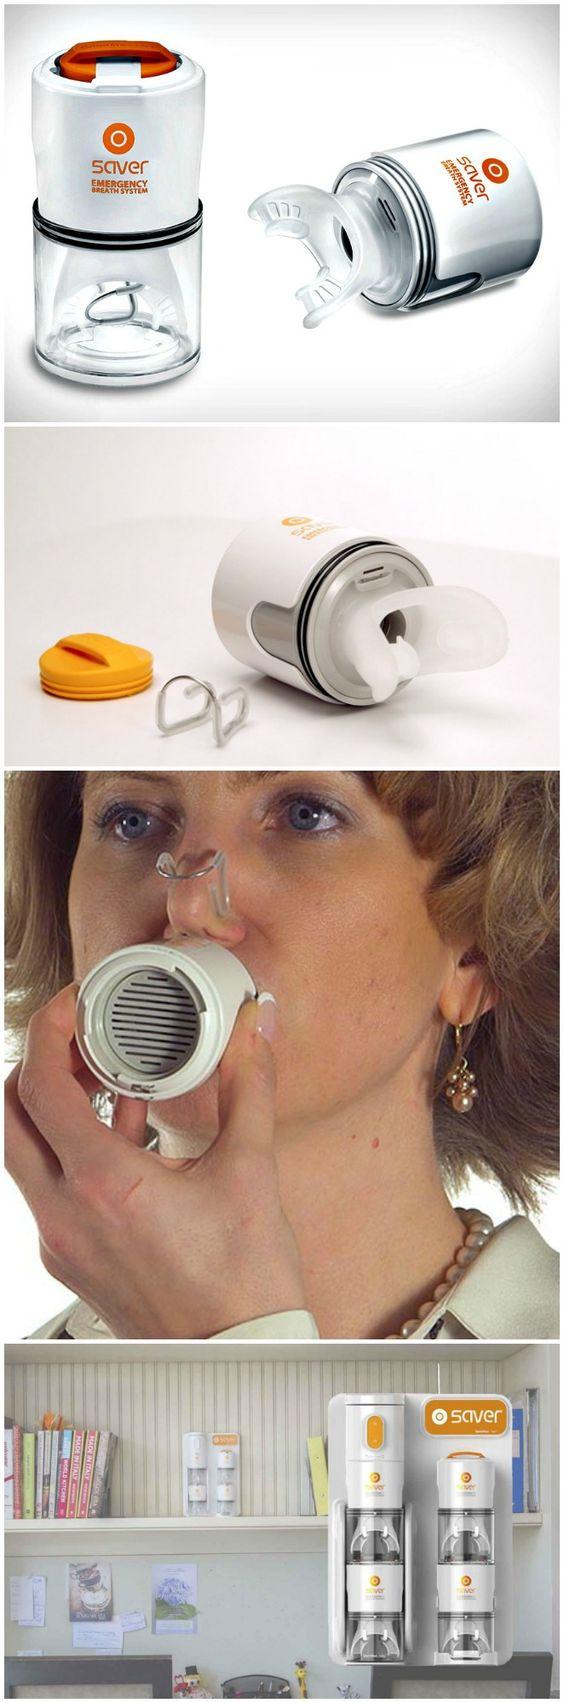 Safety iQ Saver Emergency Breath System Fire Safety